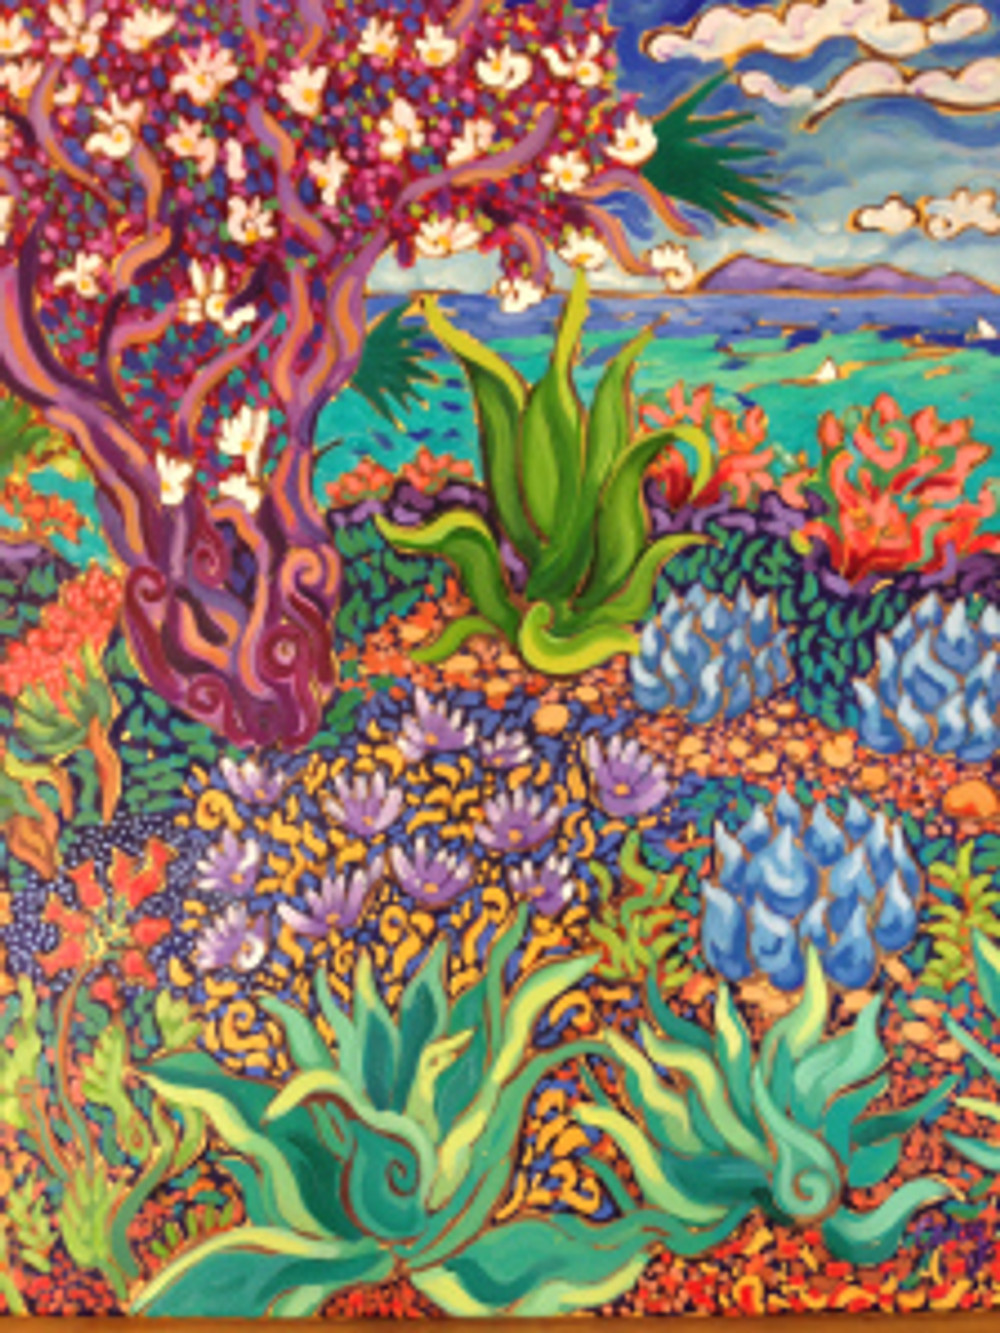 Seaside Flowers Tree by Cathy Carey ©2014